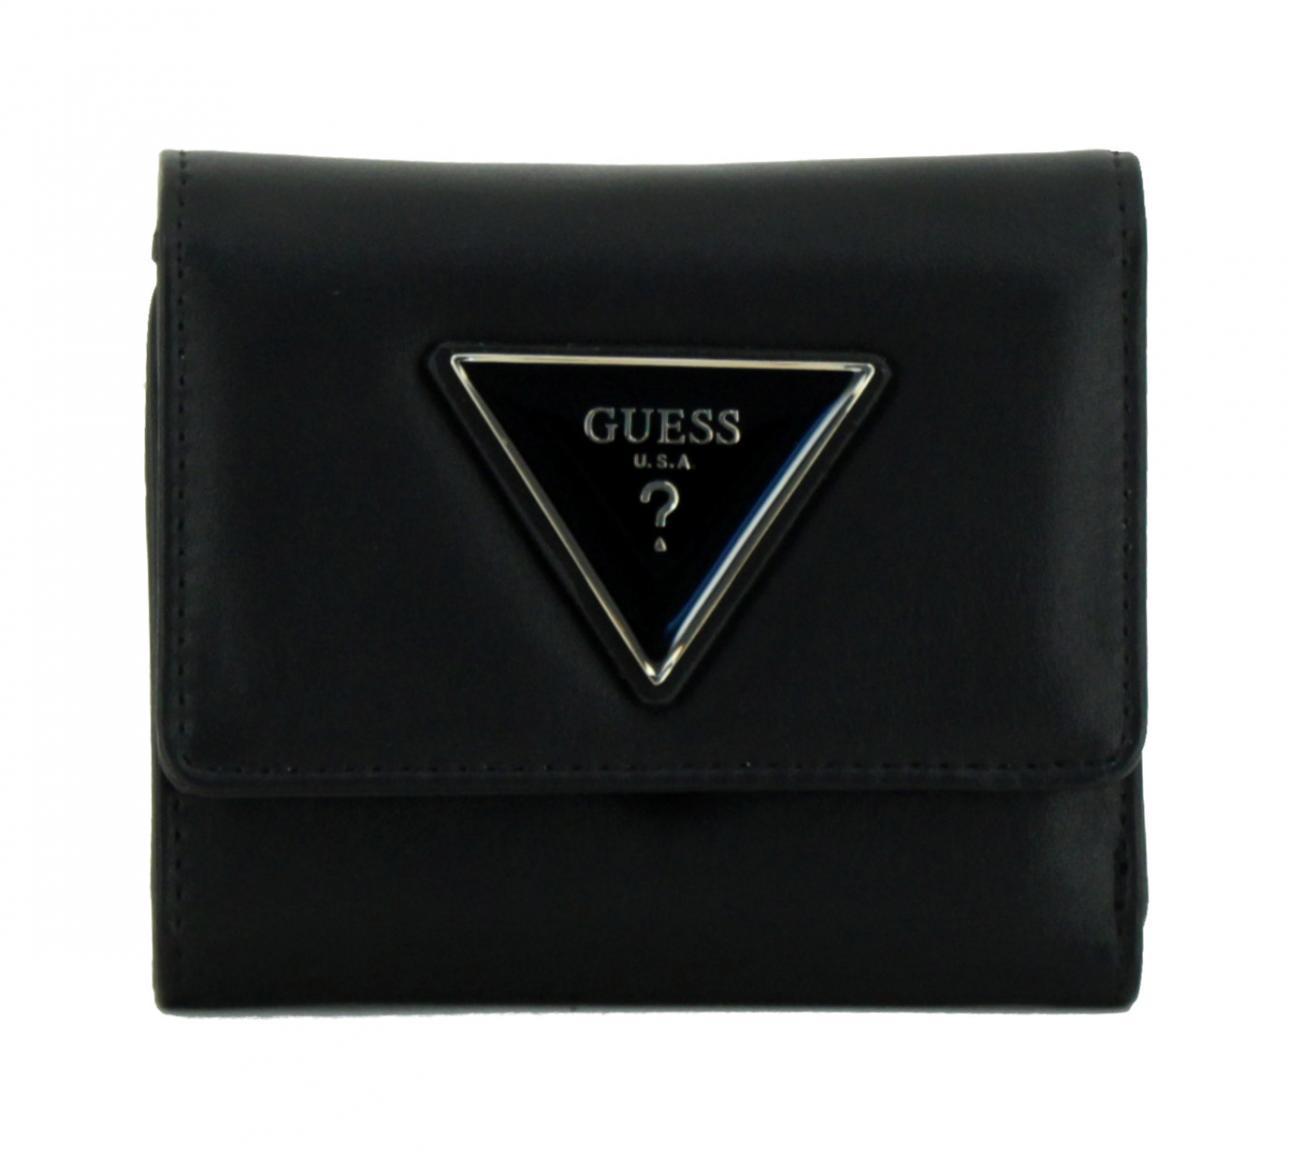 Damengeldtasche Kamryn SLG Black Guess schwarz klappbar